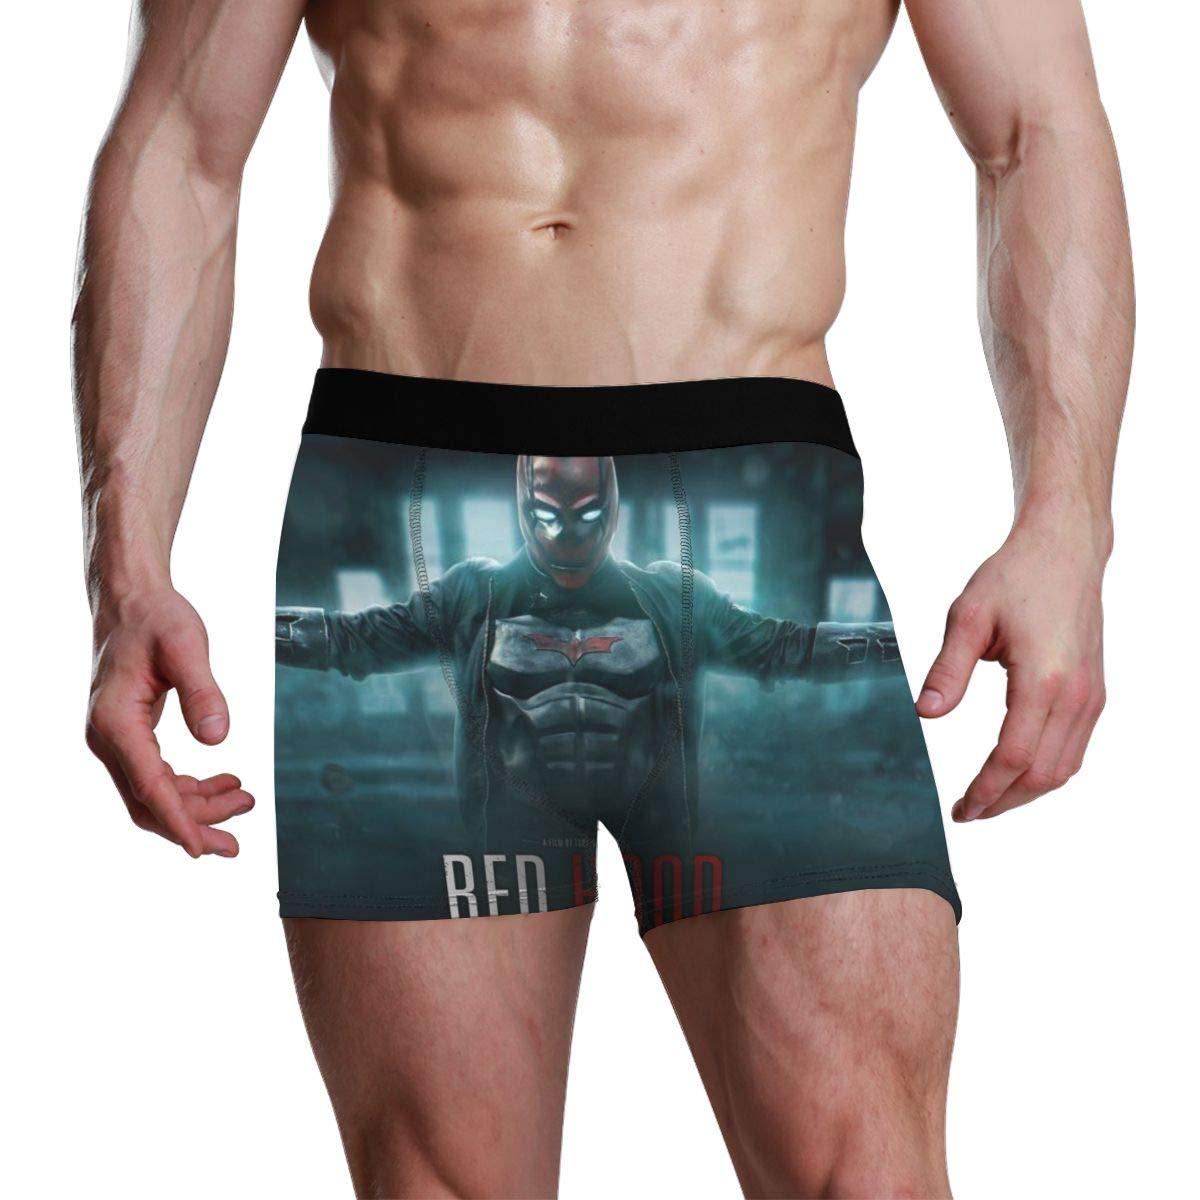 OJSFE Boxer Briefs Mens Underwear Pack Seamless Comfort SoftRed Hood